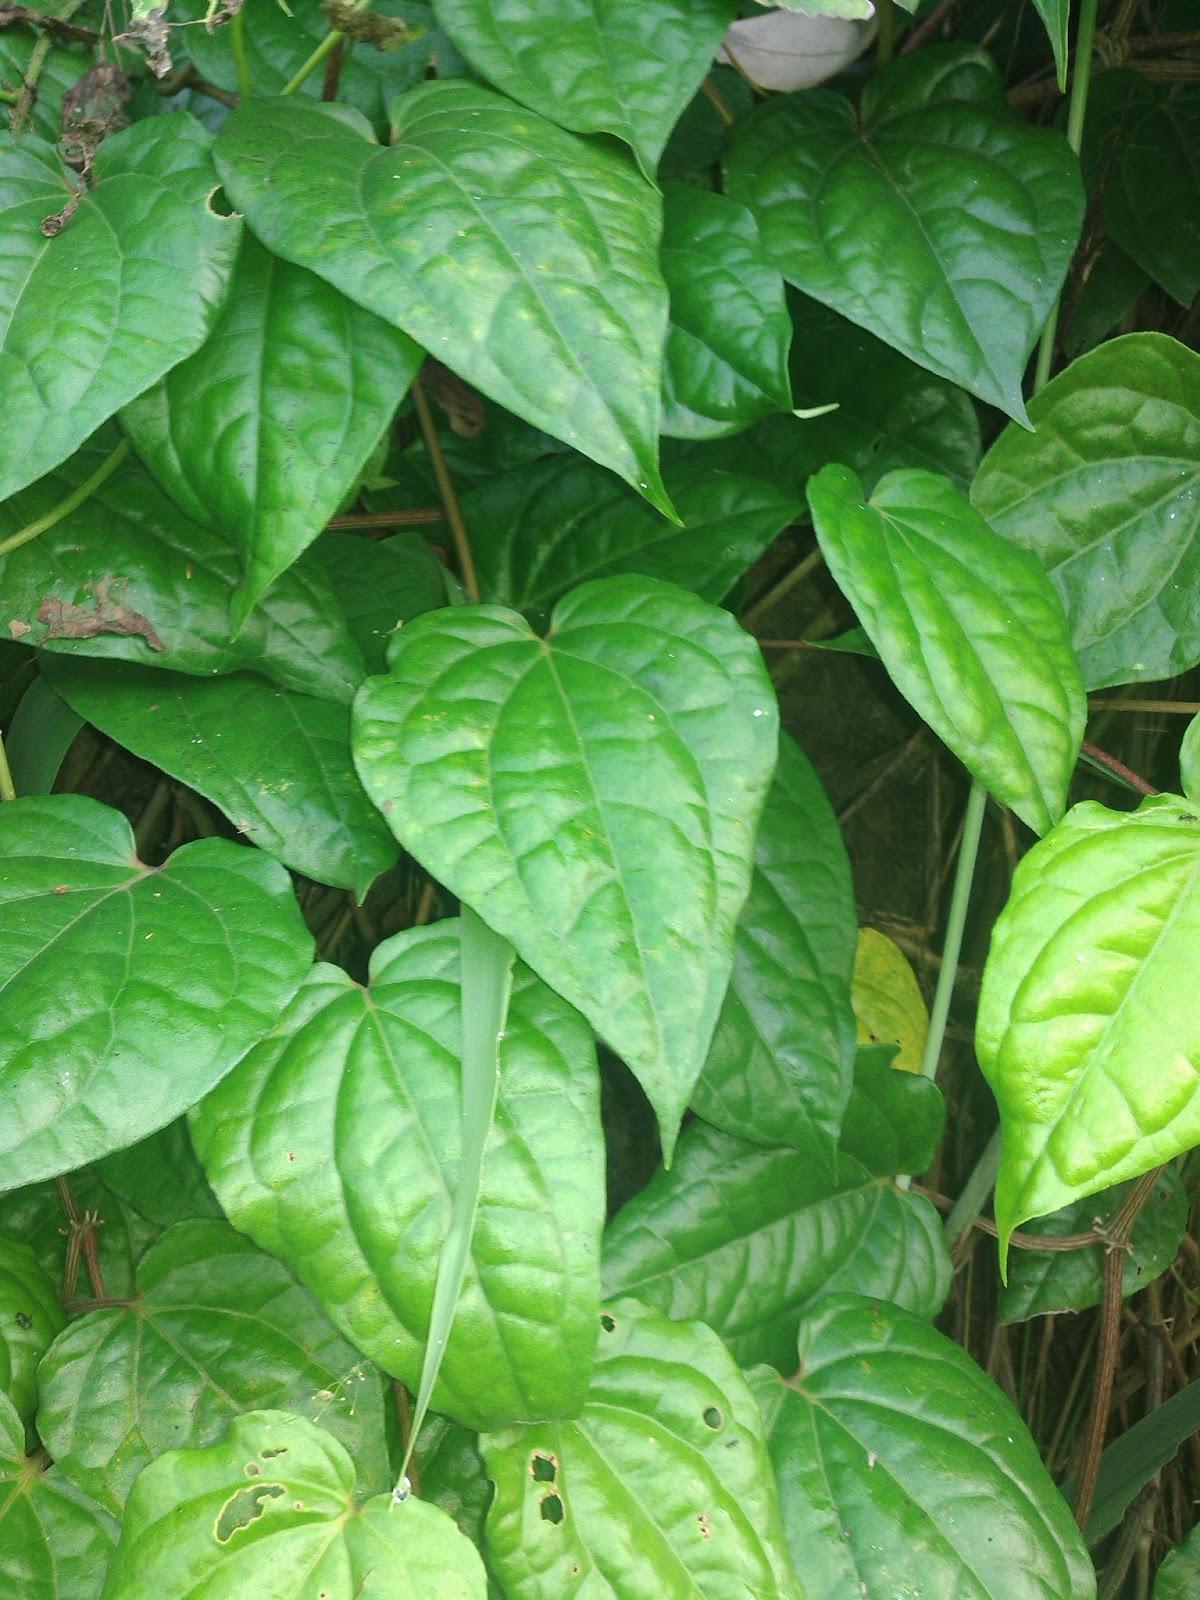 Daun Mengkudu Buat Lovebird : mengkudu, lovebird, Manfaat, Sirih, Untuk, Burung, Berkicau, Kicau, Sejati